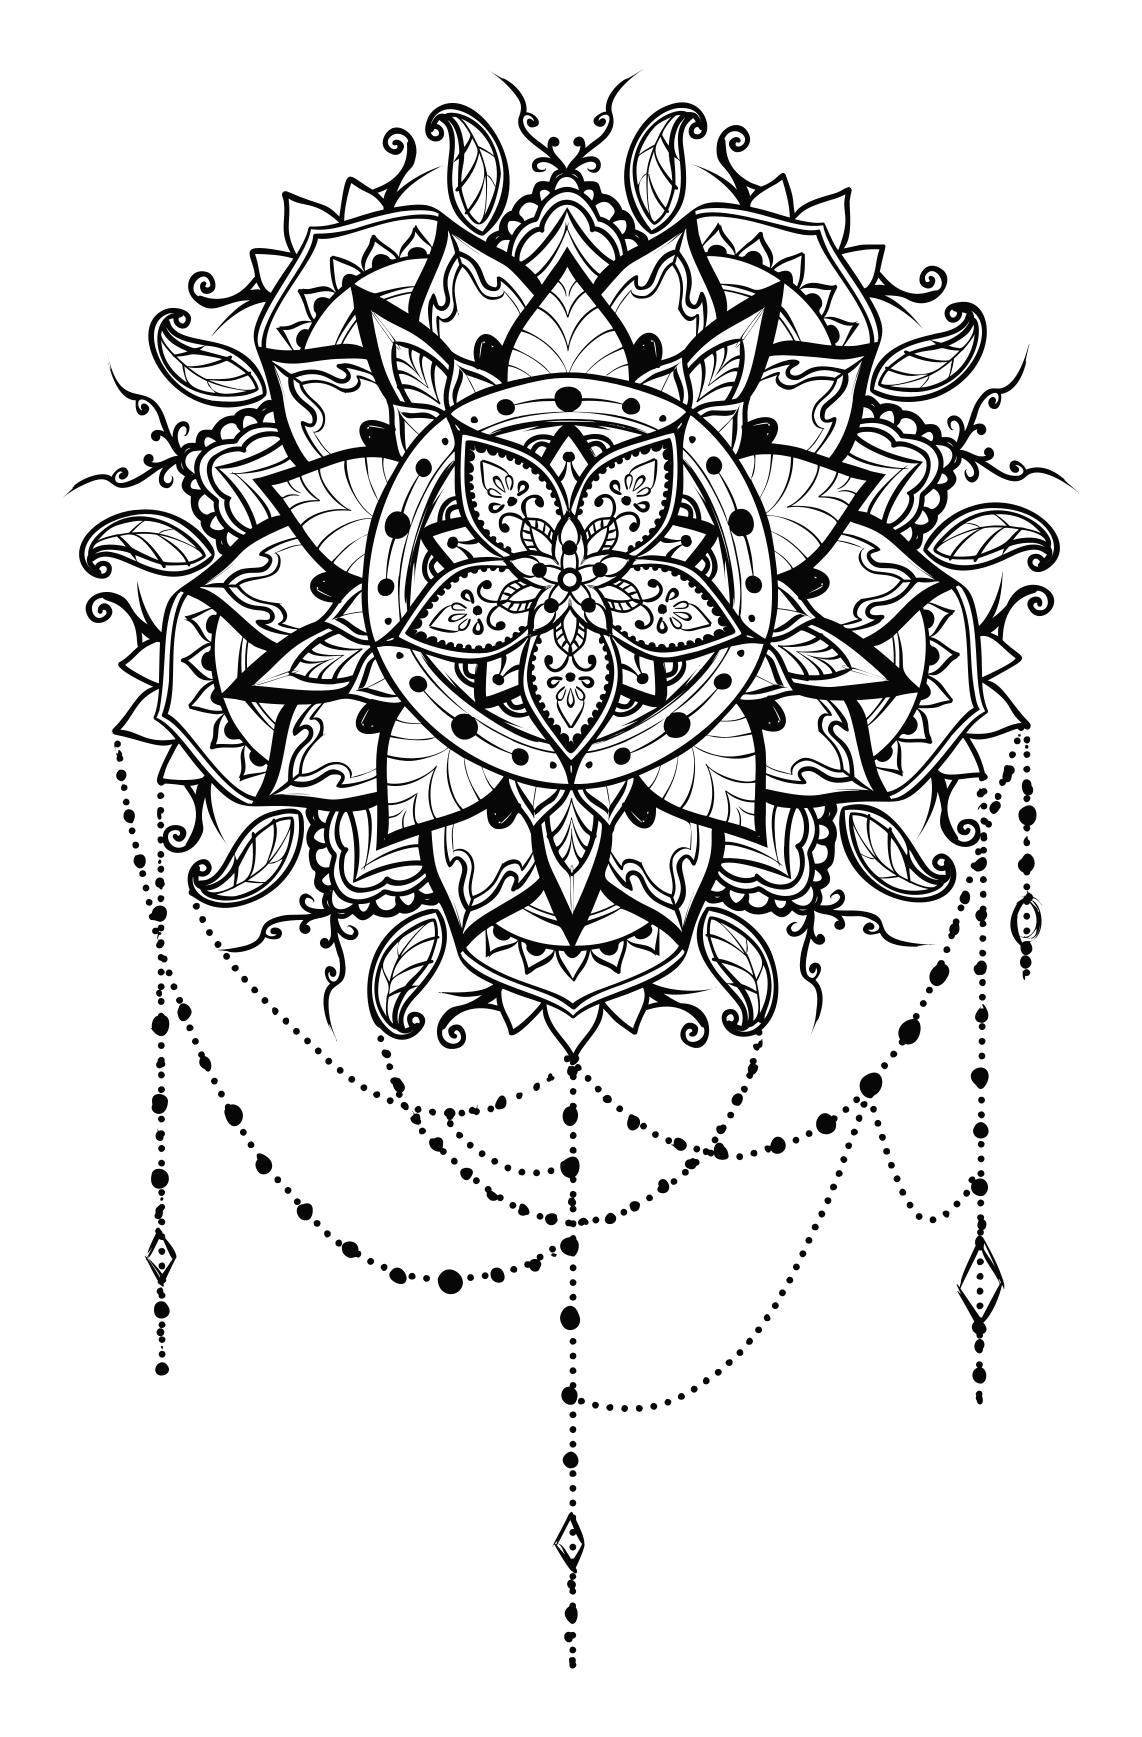 Mandala clipart. Intricate floral design droide